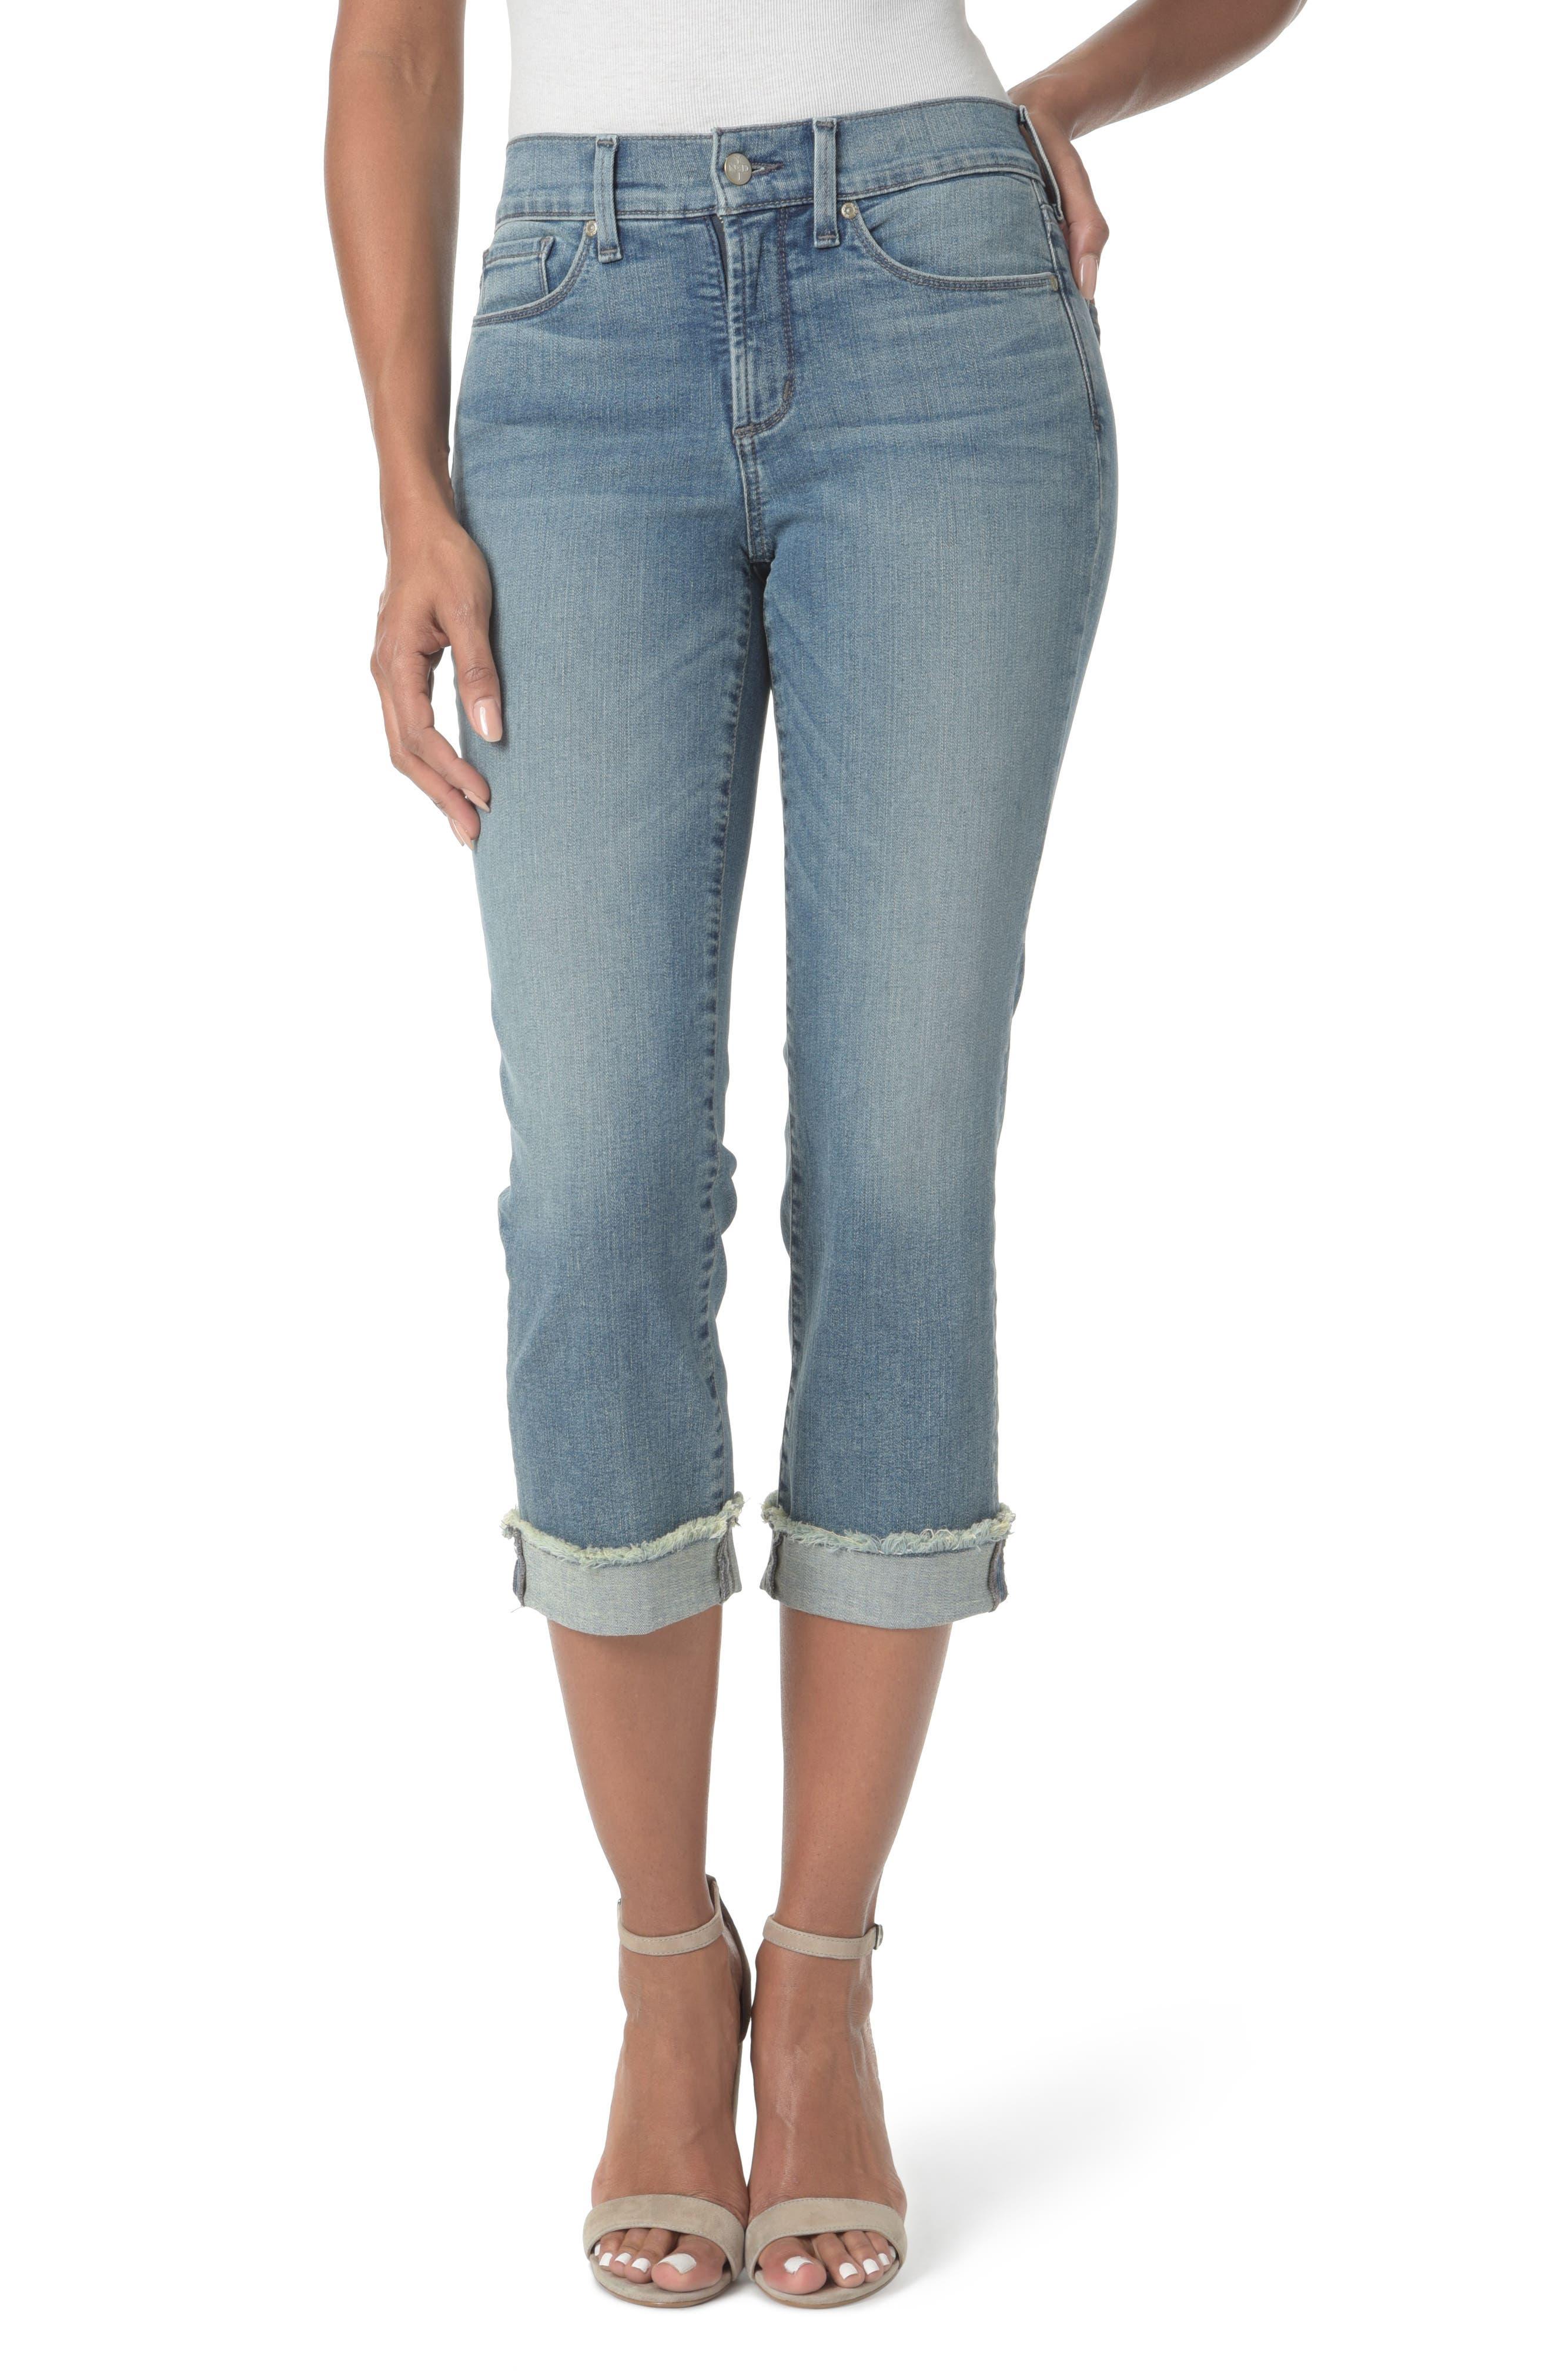 Main Image - NYDJ Marilyn Cropped Cuff Jeans (Regular & Petite)